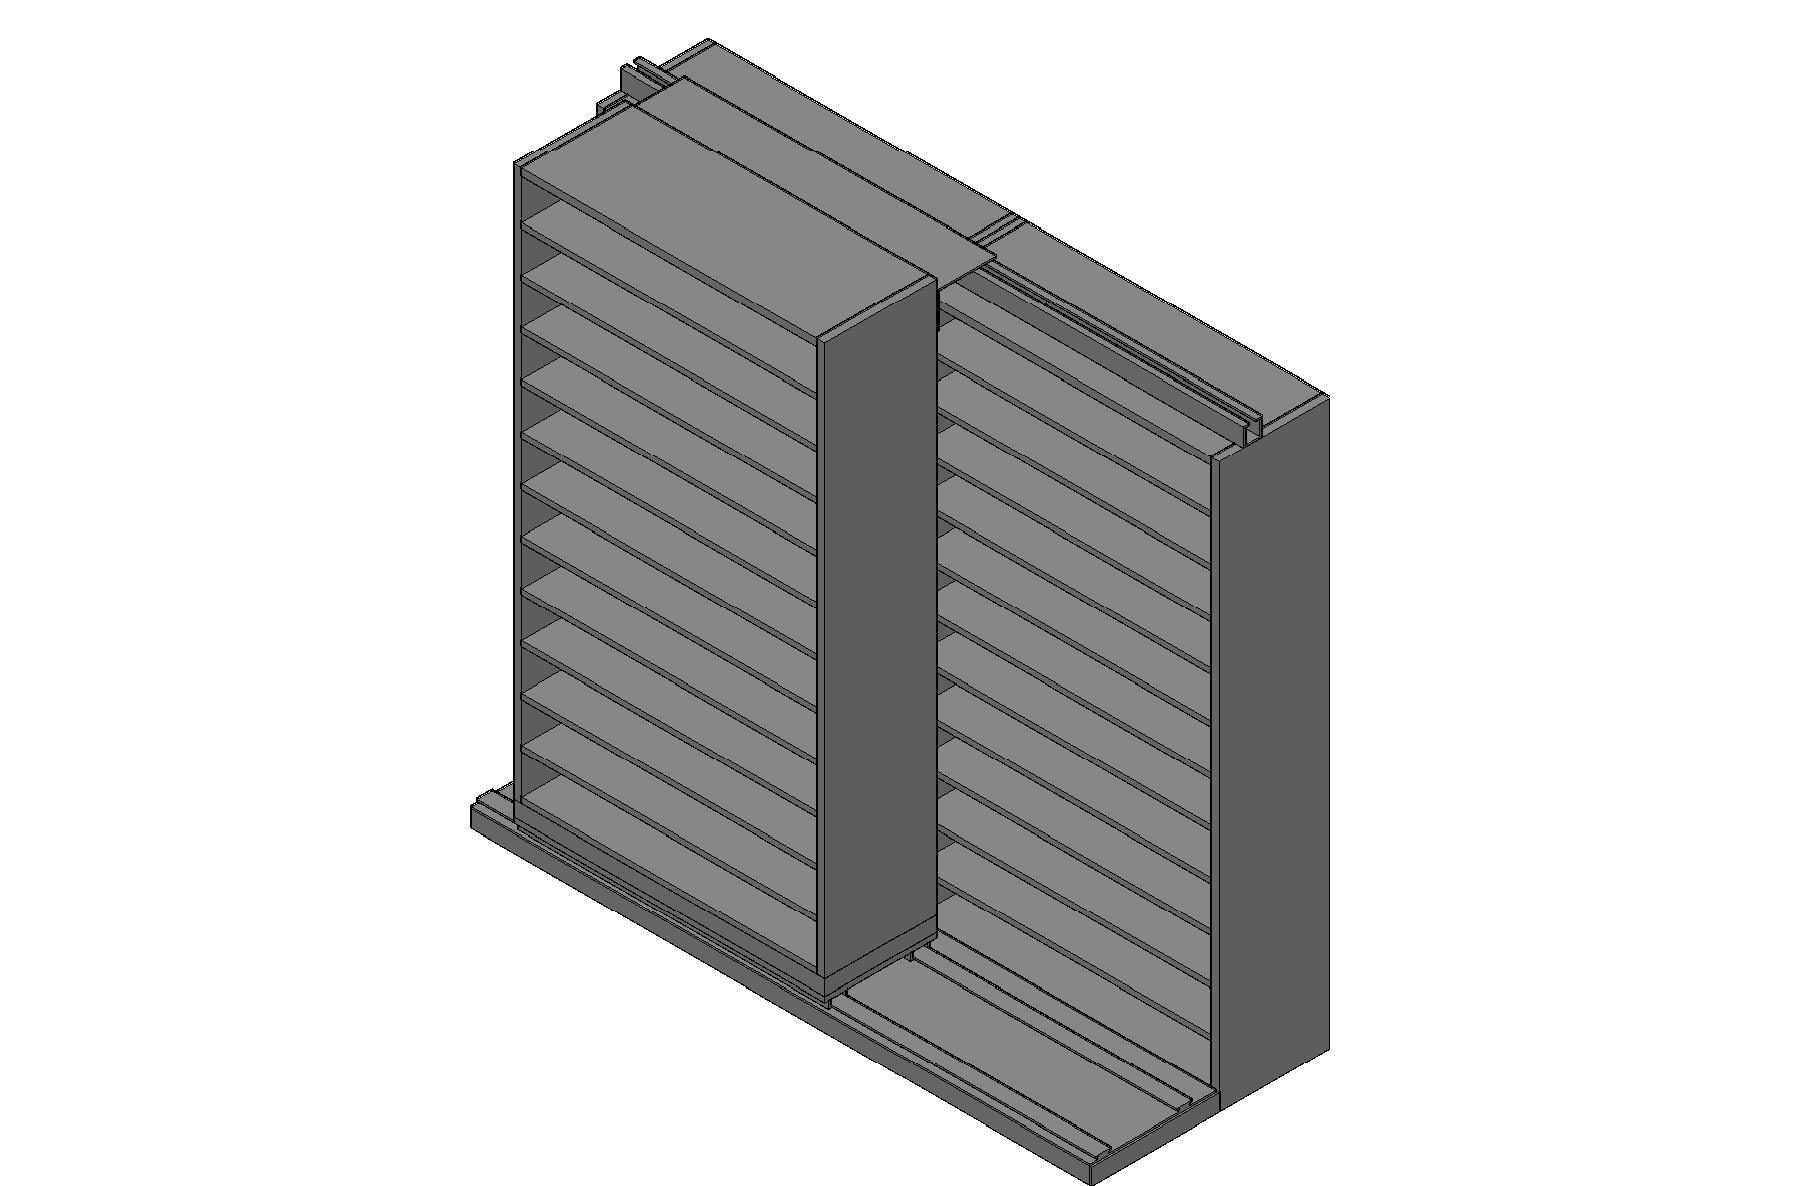 "Bin Size Sliding Shelves - 2 Rows Deep - 12 Levels - (42"" x 15"" Shelves) - 88"" Total Width"